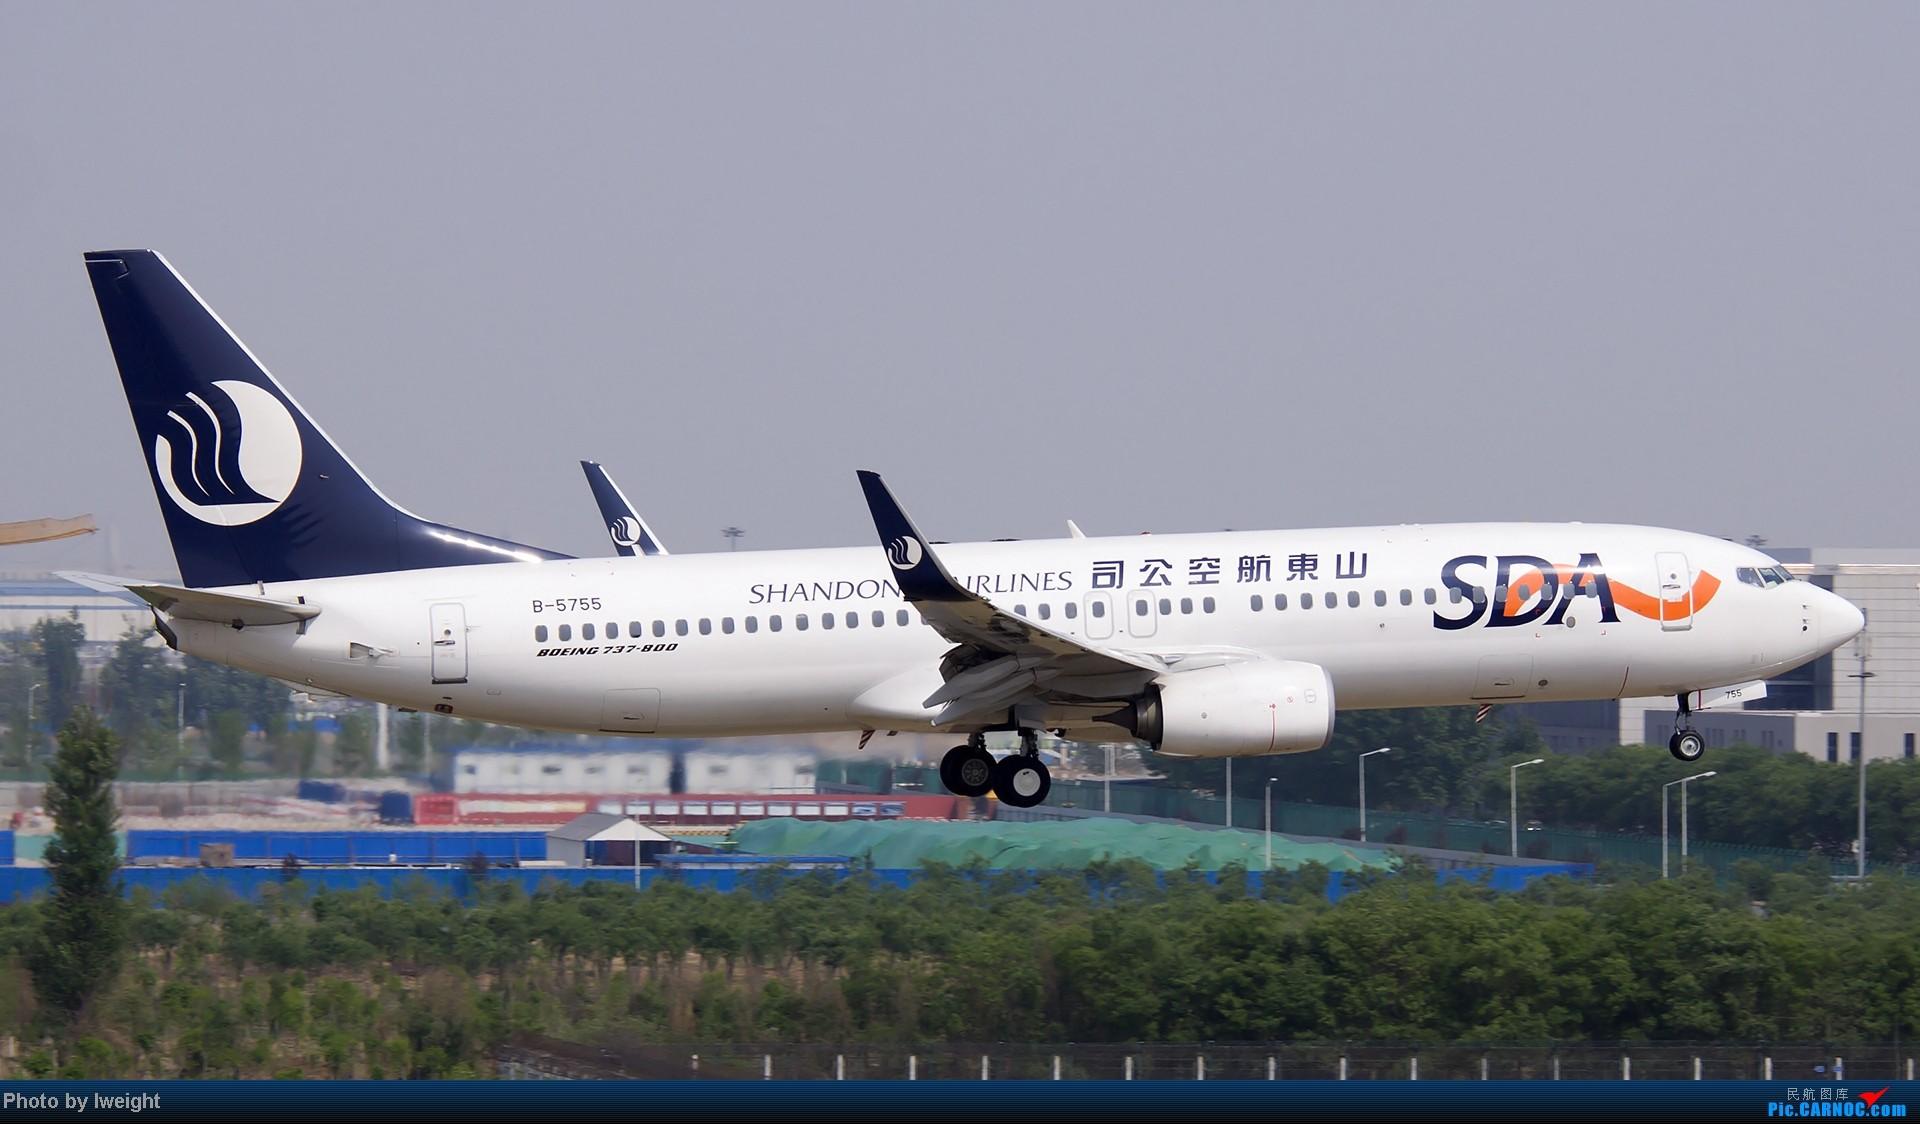 Re:[原创]错过了卡航的巴塞罗那号,只有这些大路货了,泪奔啊 BOEING 737-800 B-5755 中国北京首都机场